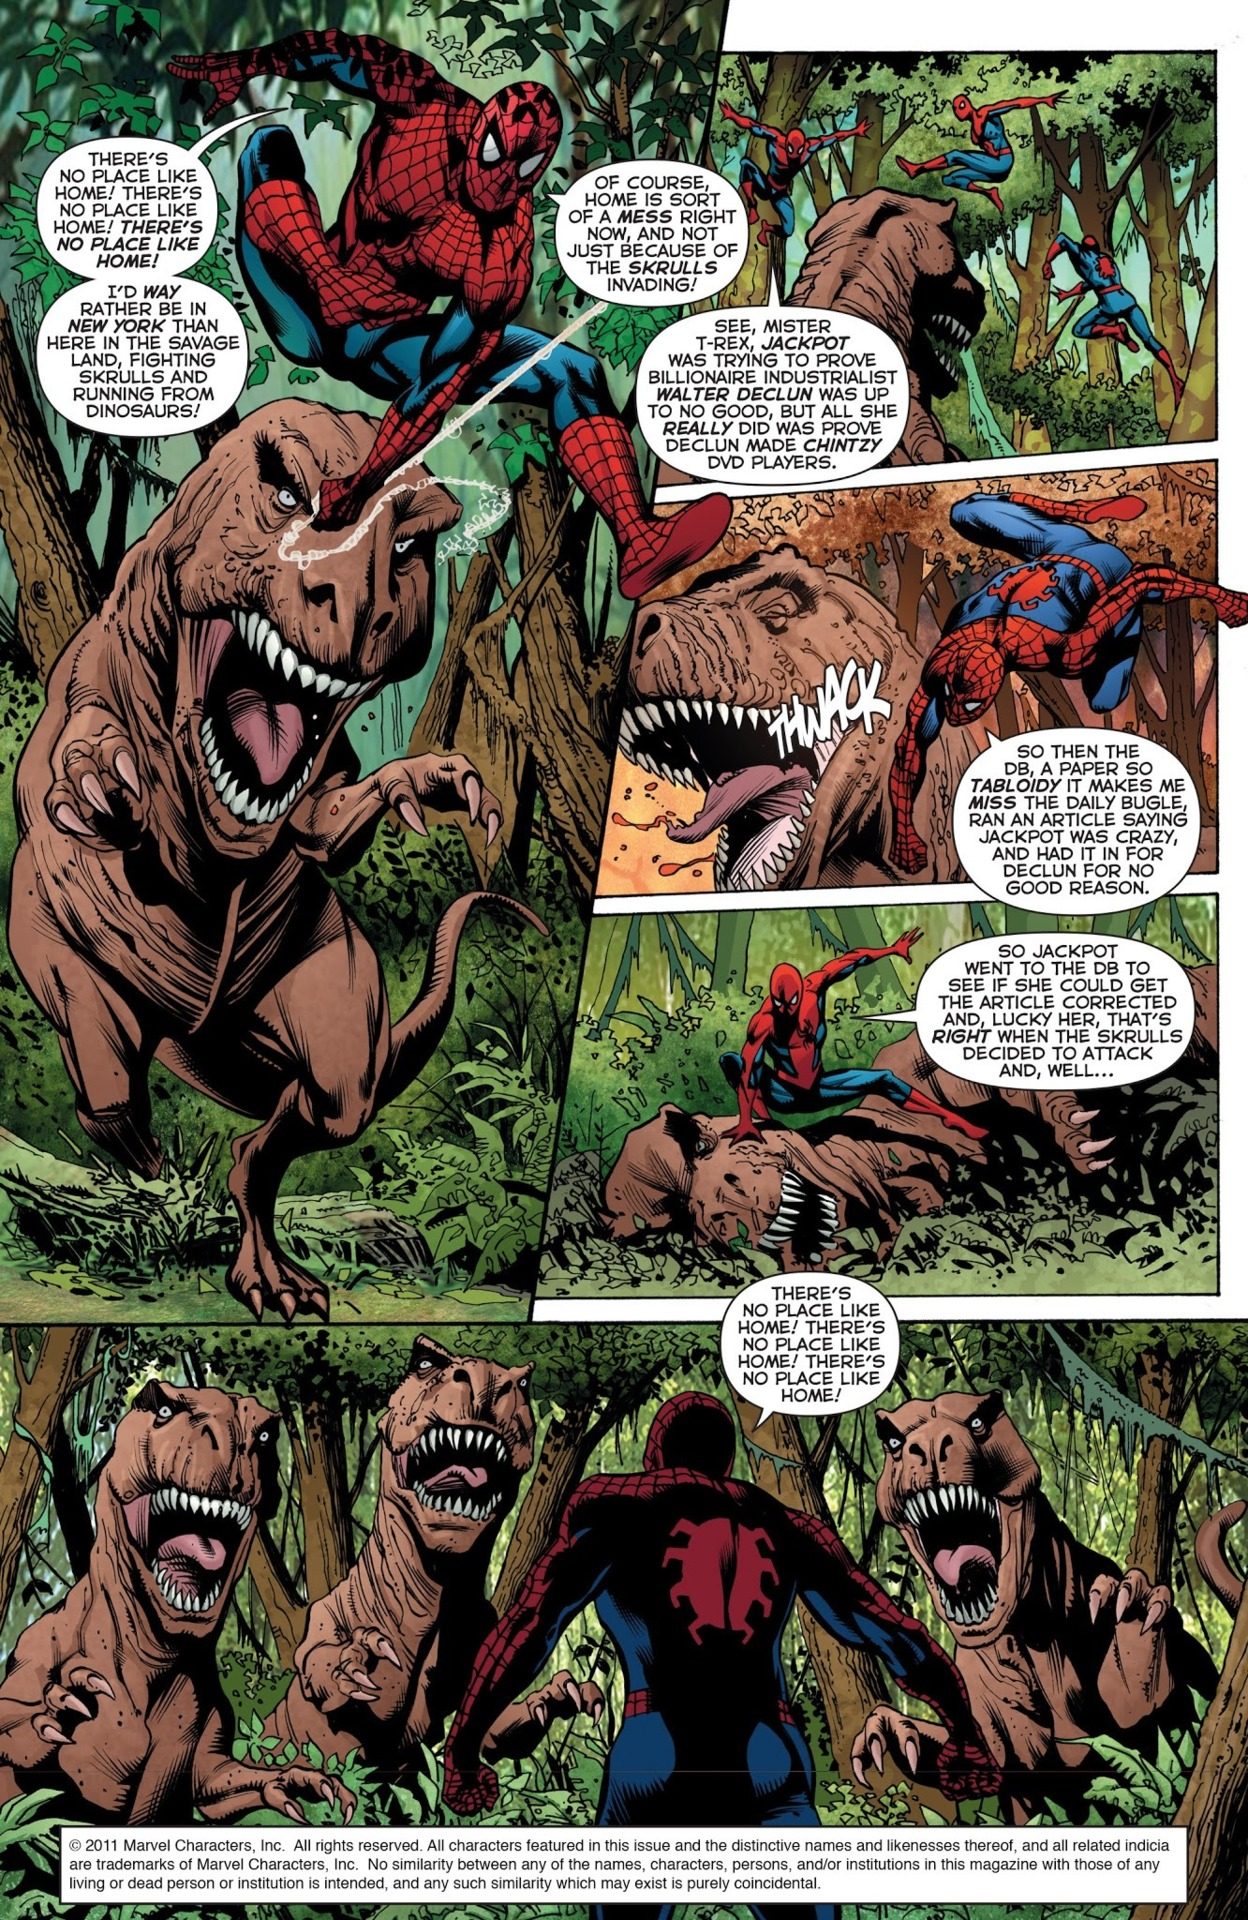 Secret Invasion: The Amazing Spider-Man #2